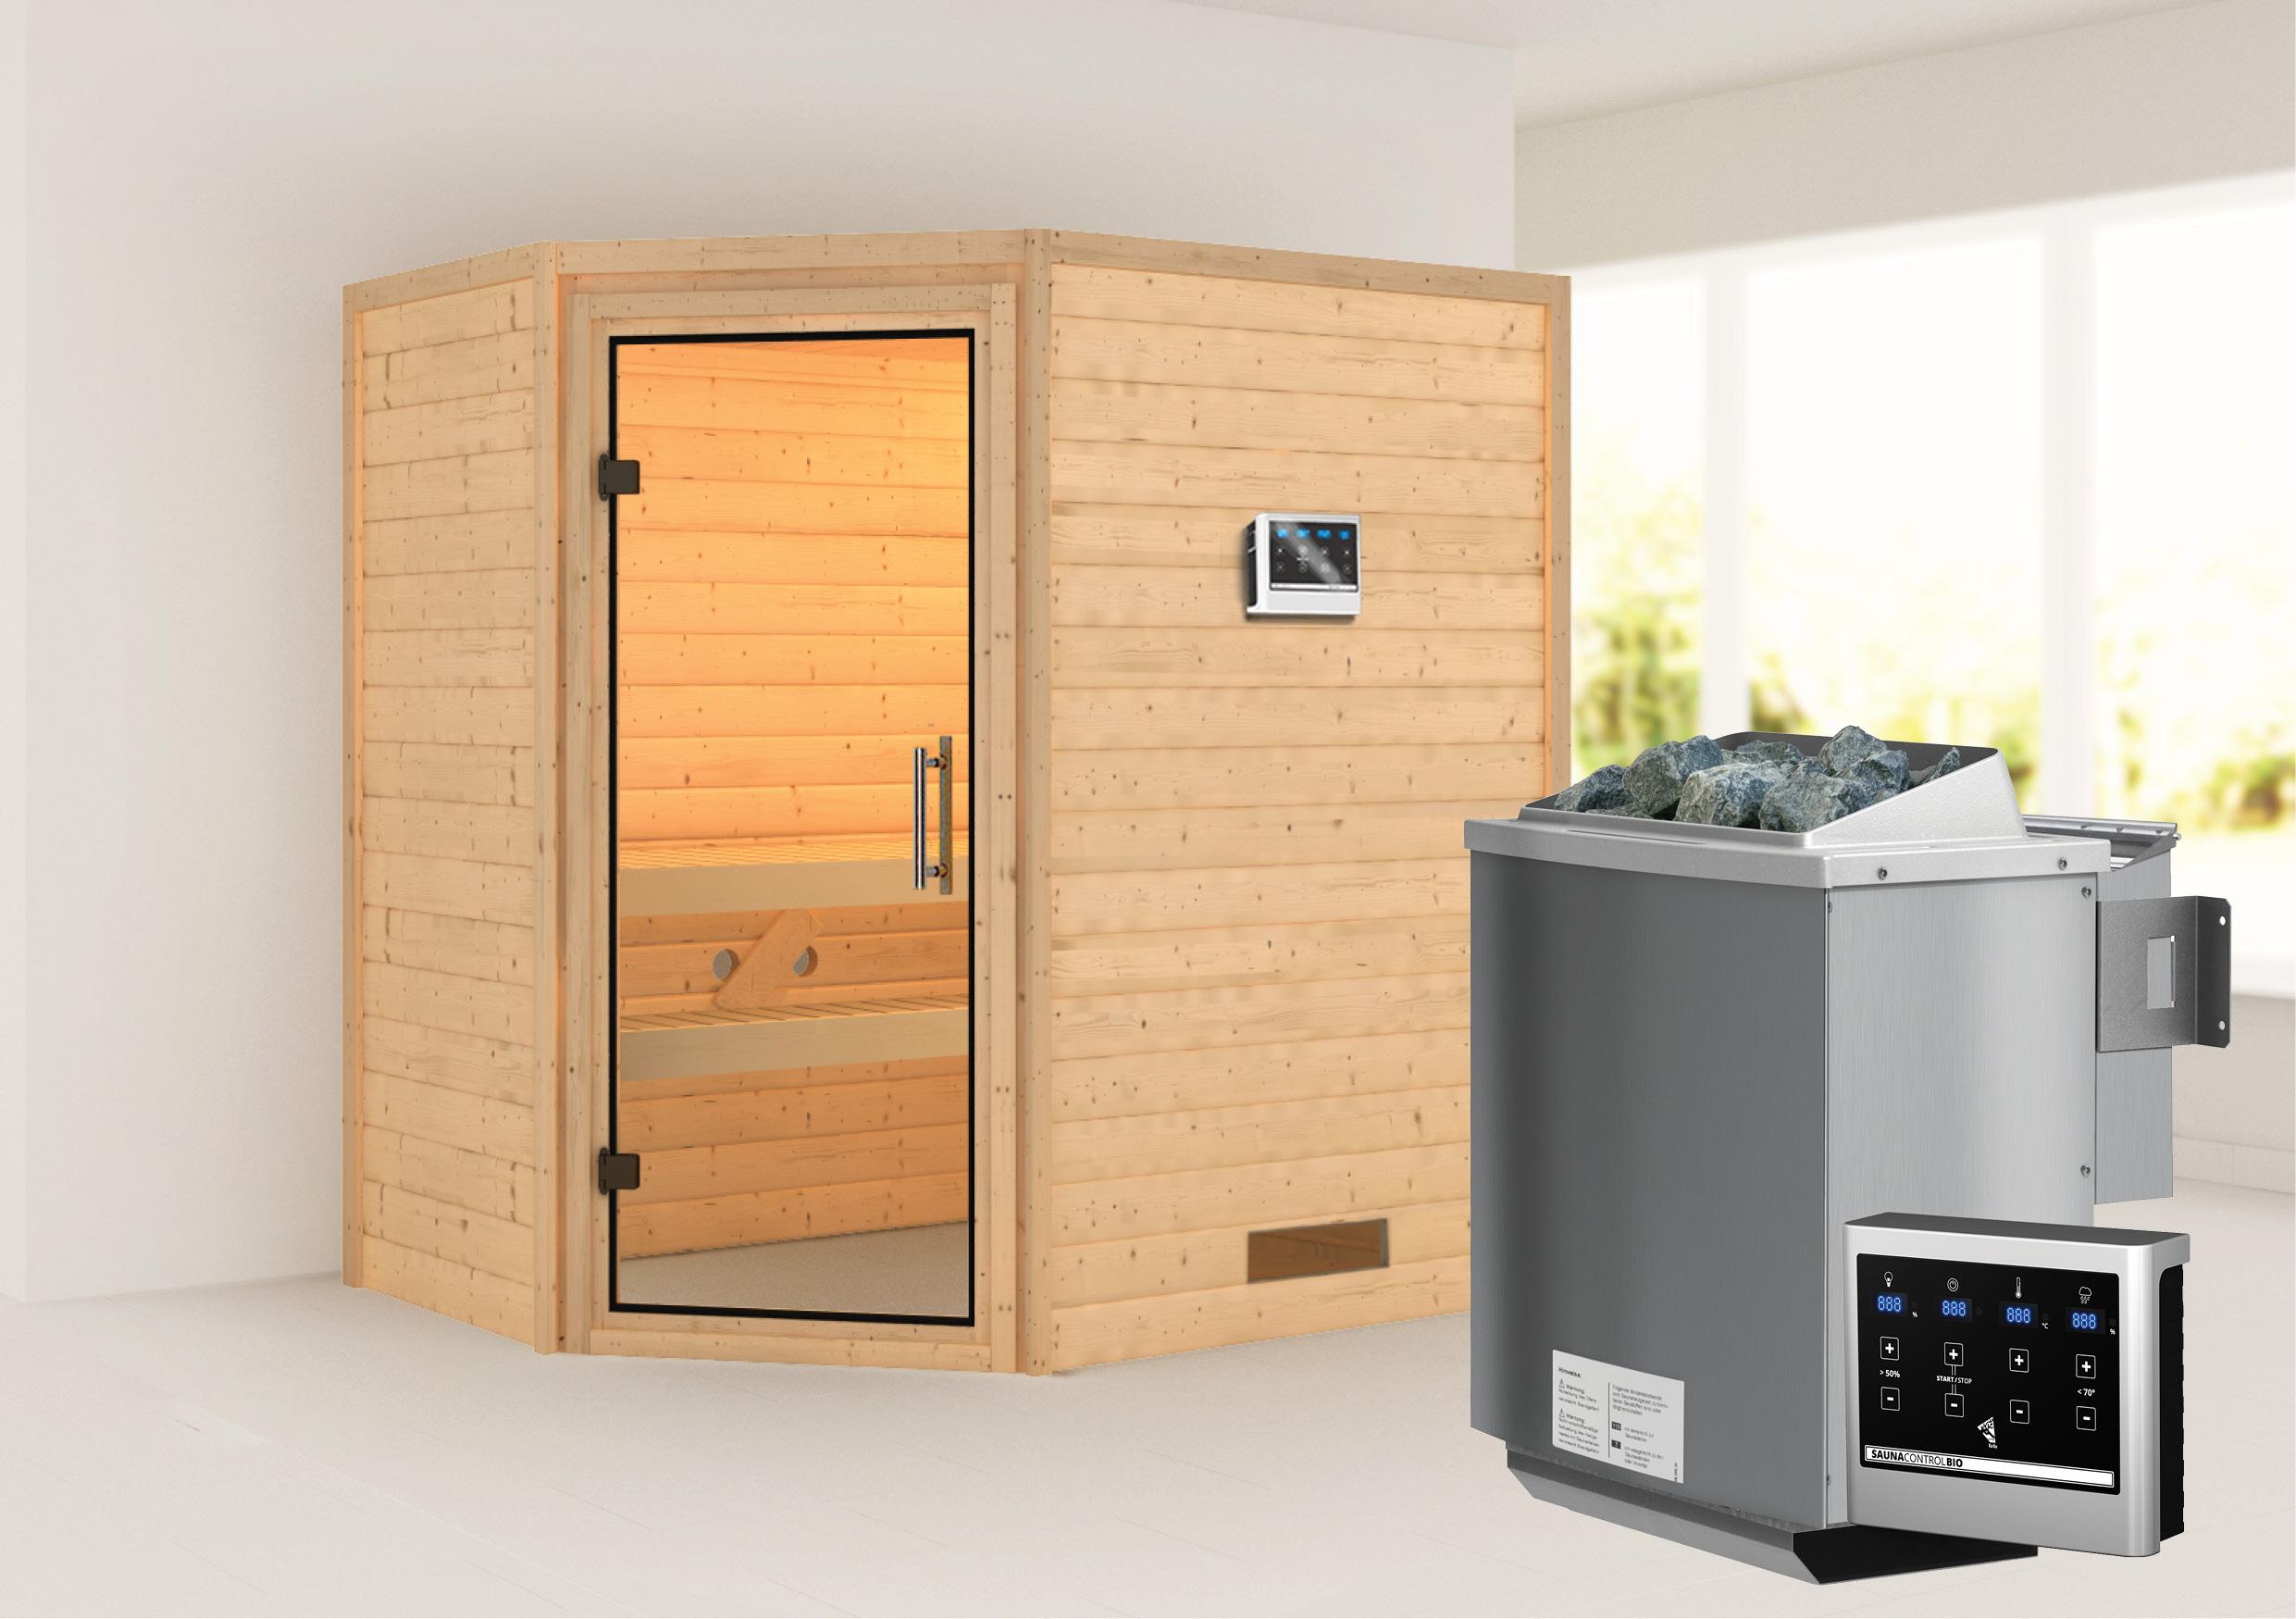 WoodFeeling Sauna Svea 38mm mit Bio Saunaofen 9 kW extern Klarglas Tür Bild 1